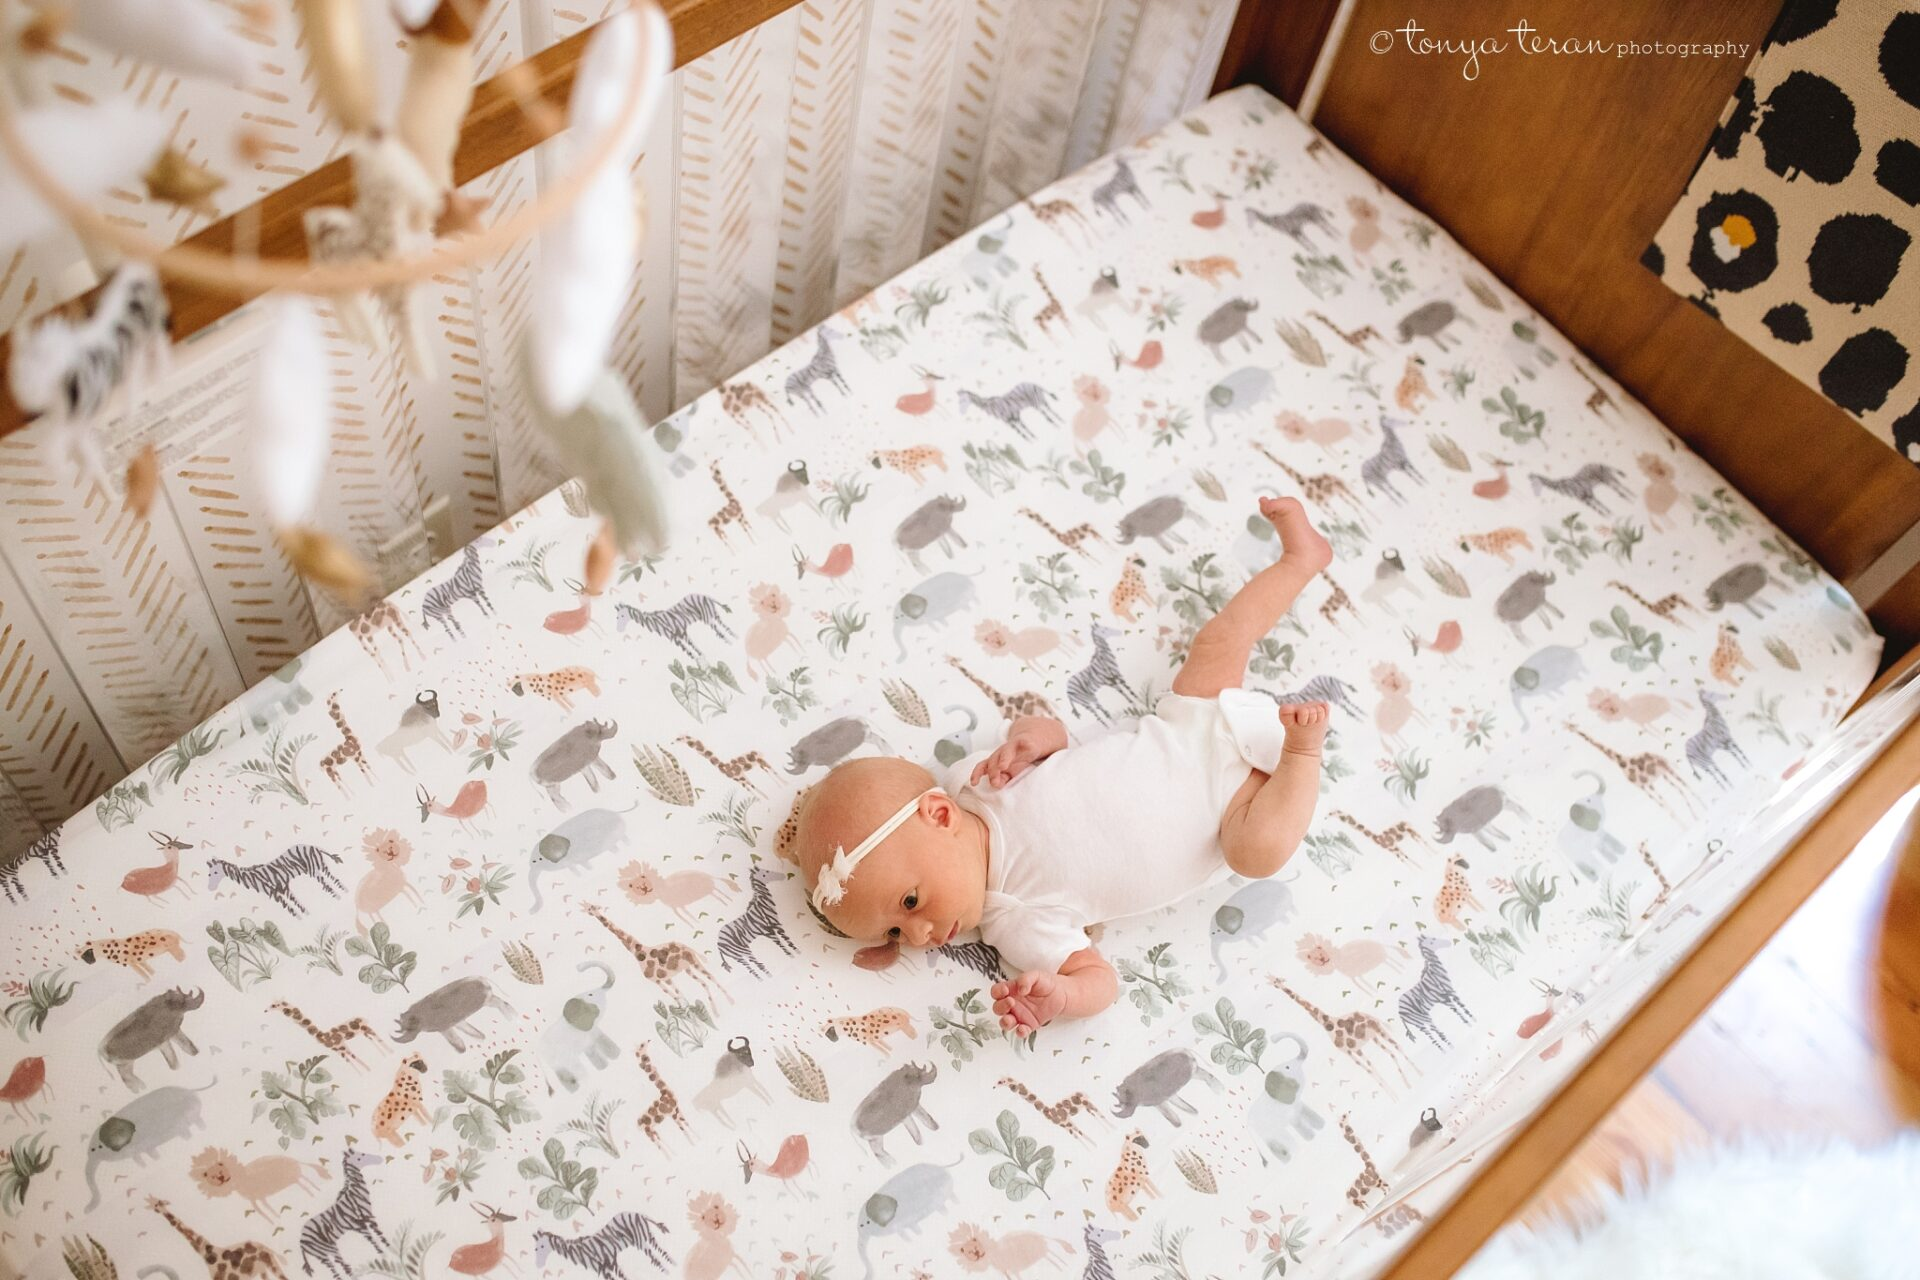 covid safe in-home lifestyle newborn session - dc md va newborn photographer